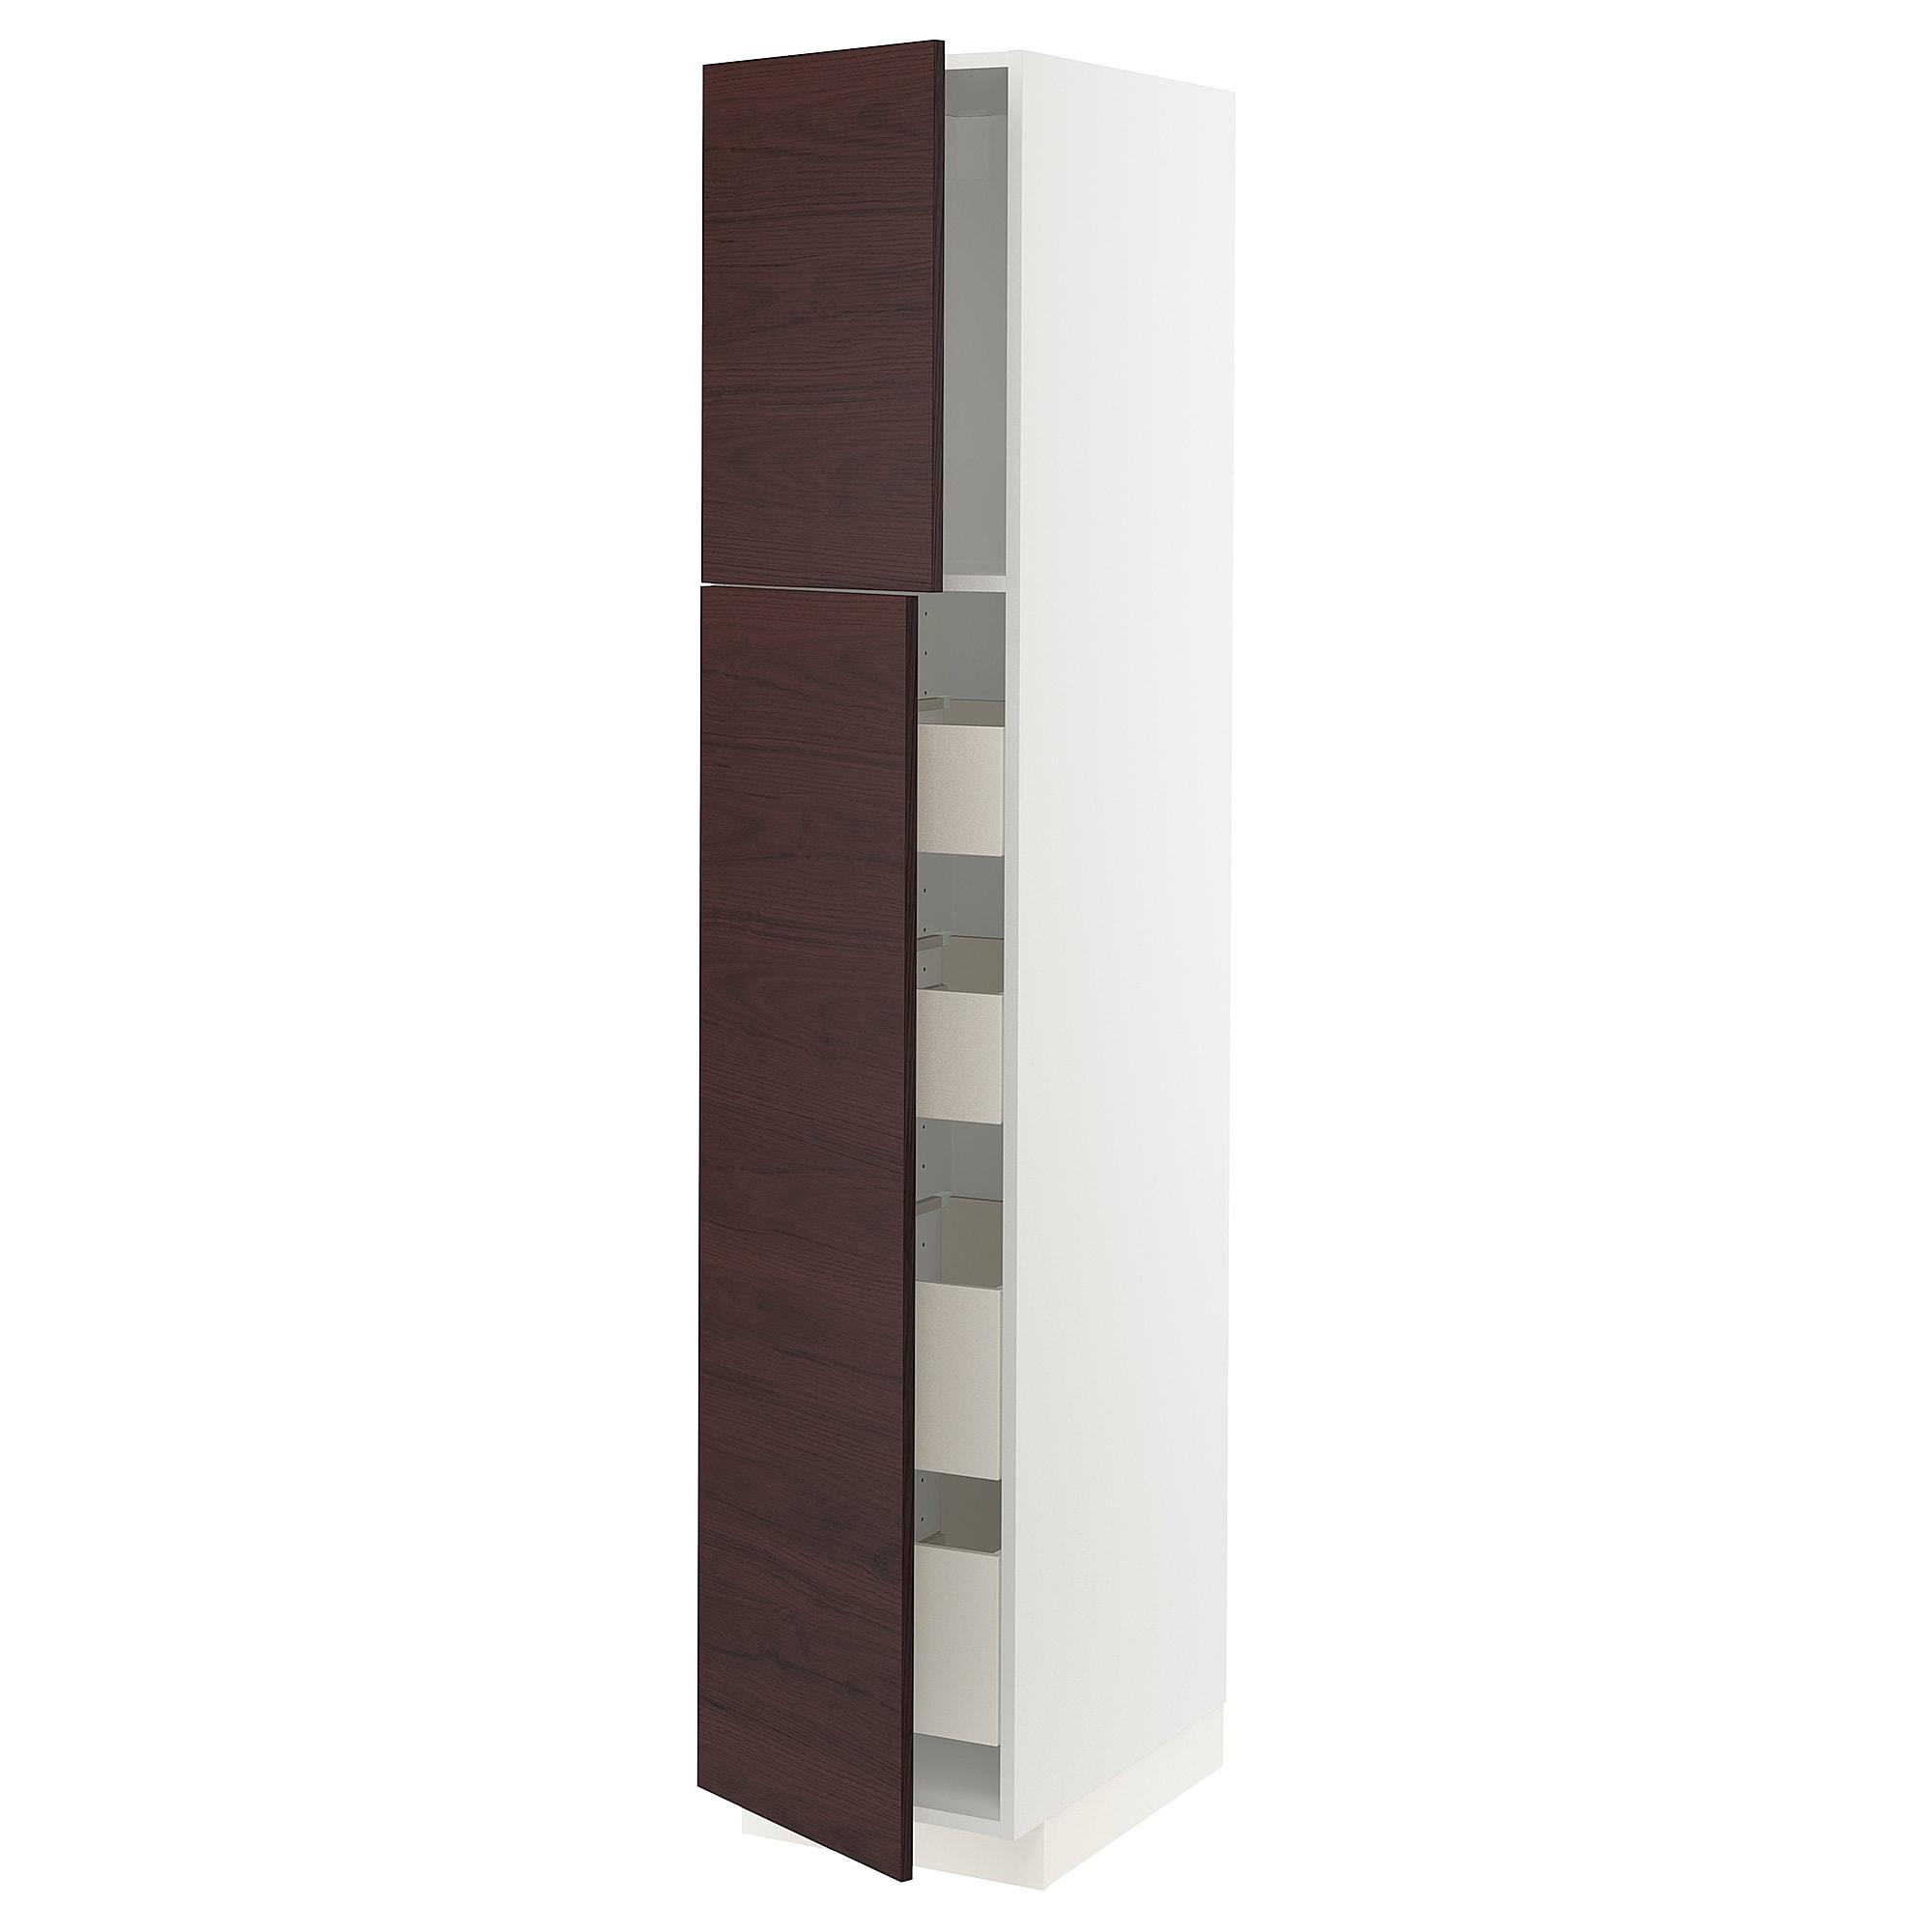 metod / maximera висока шафа 2 дверцят/4 шухляди